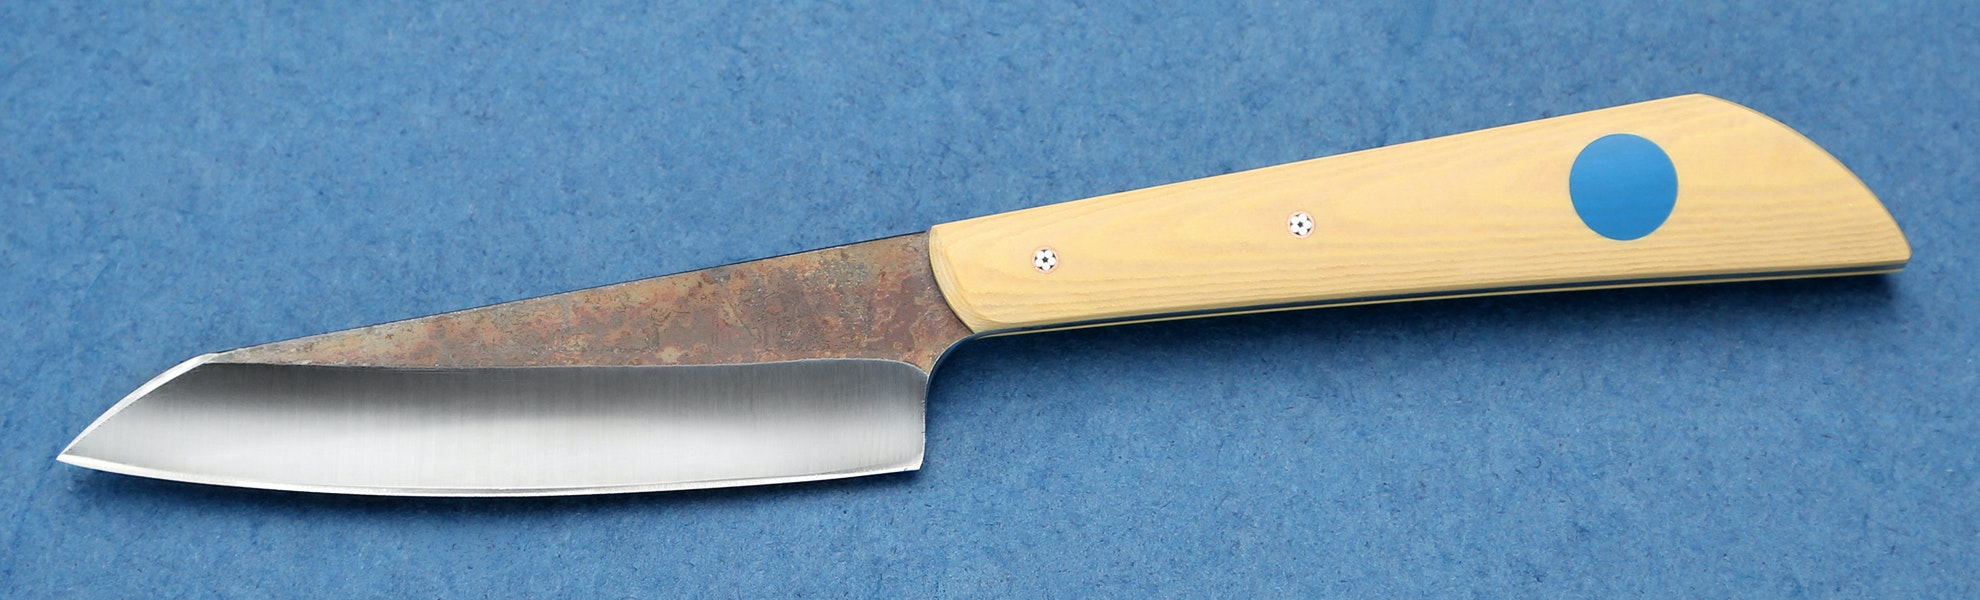 California Custom Utility Paring Knife